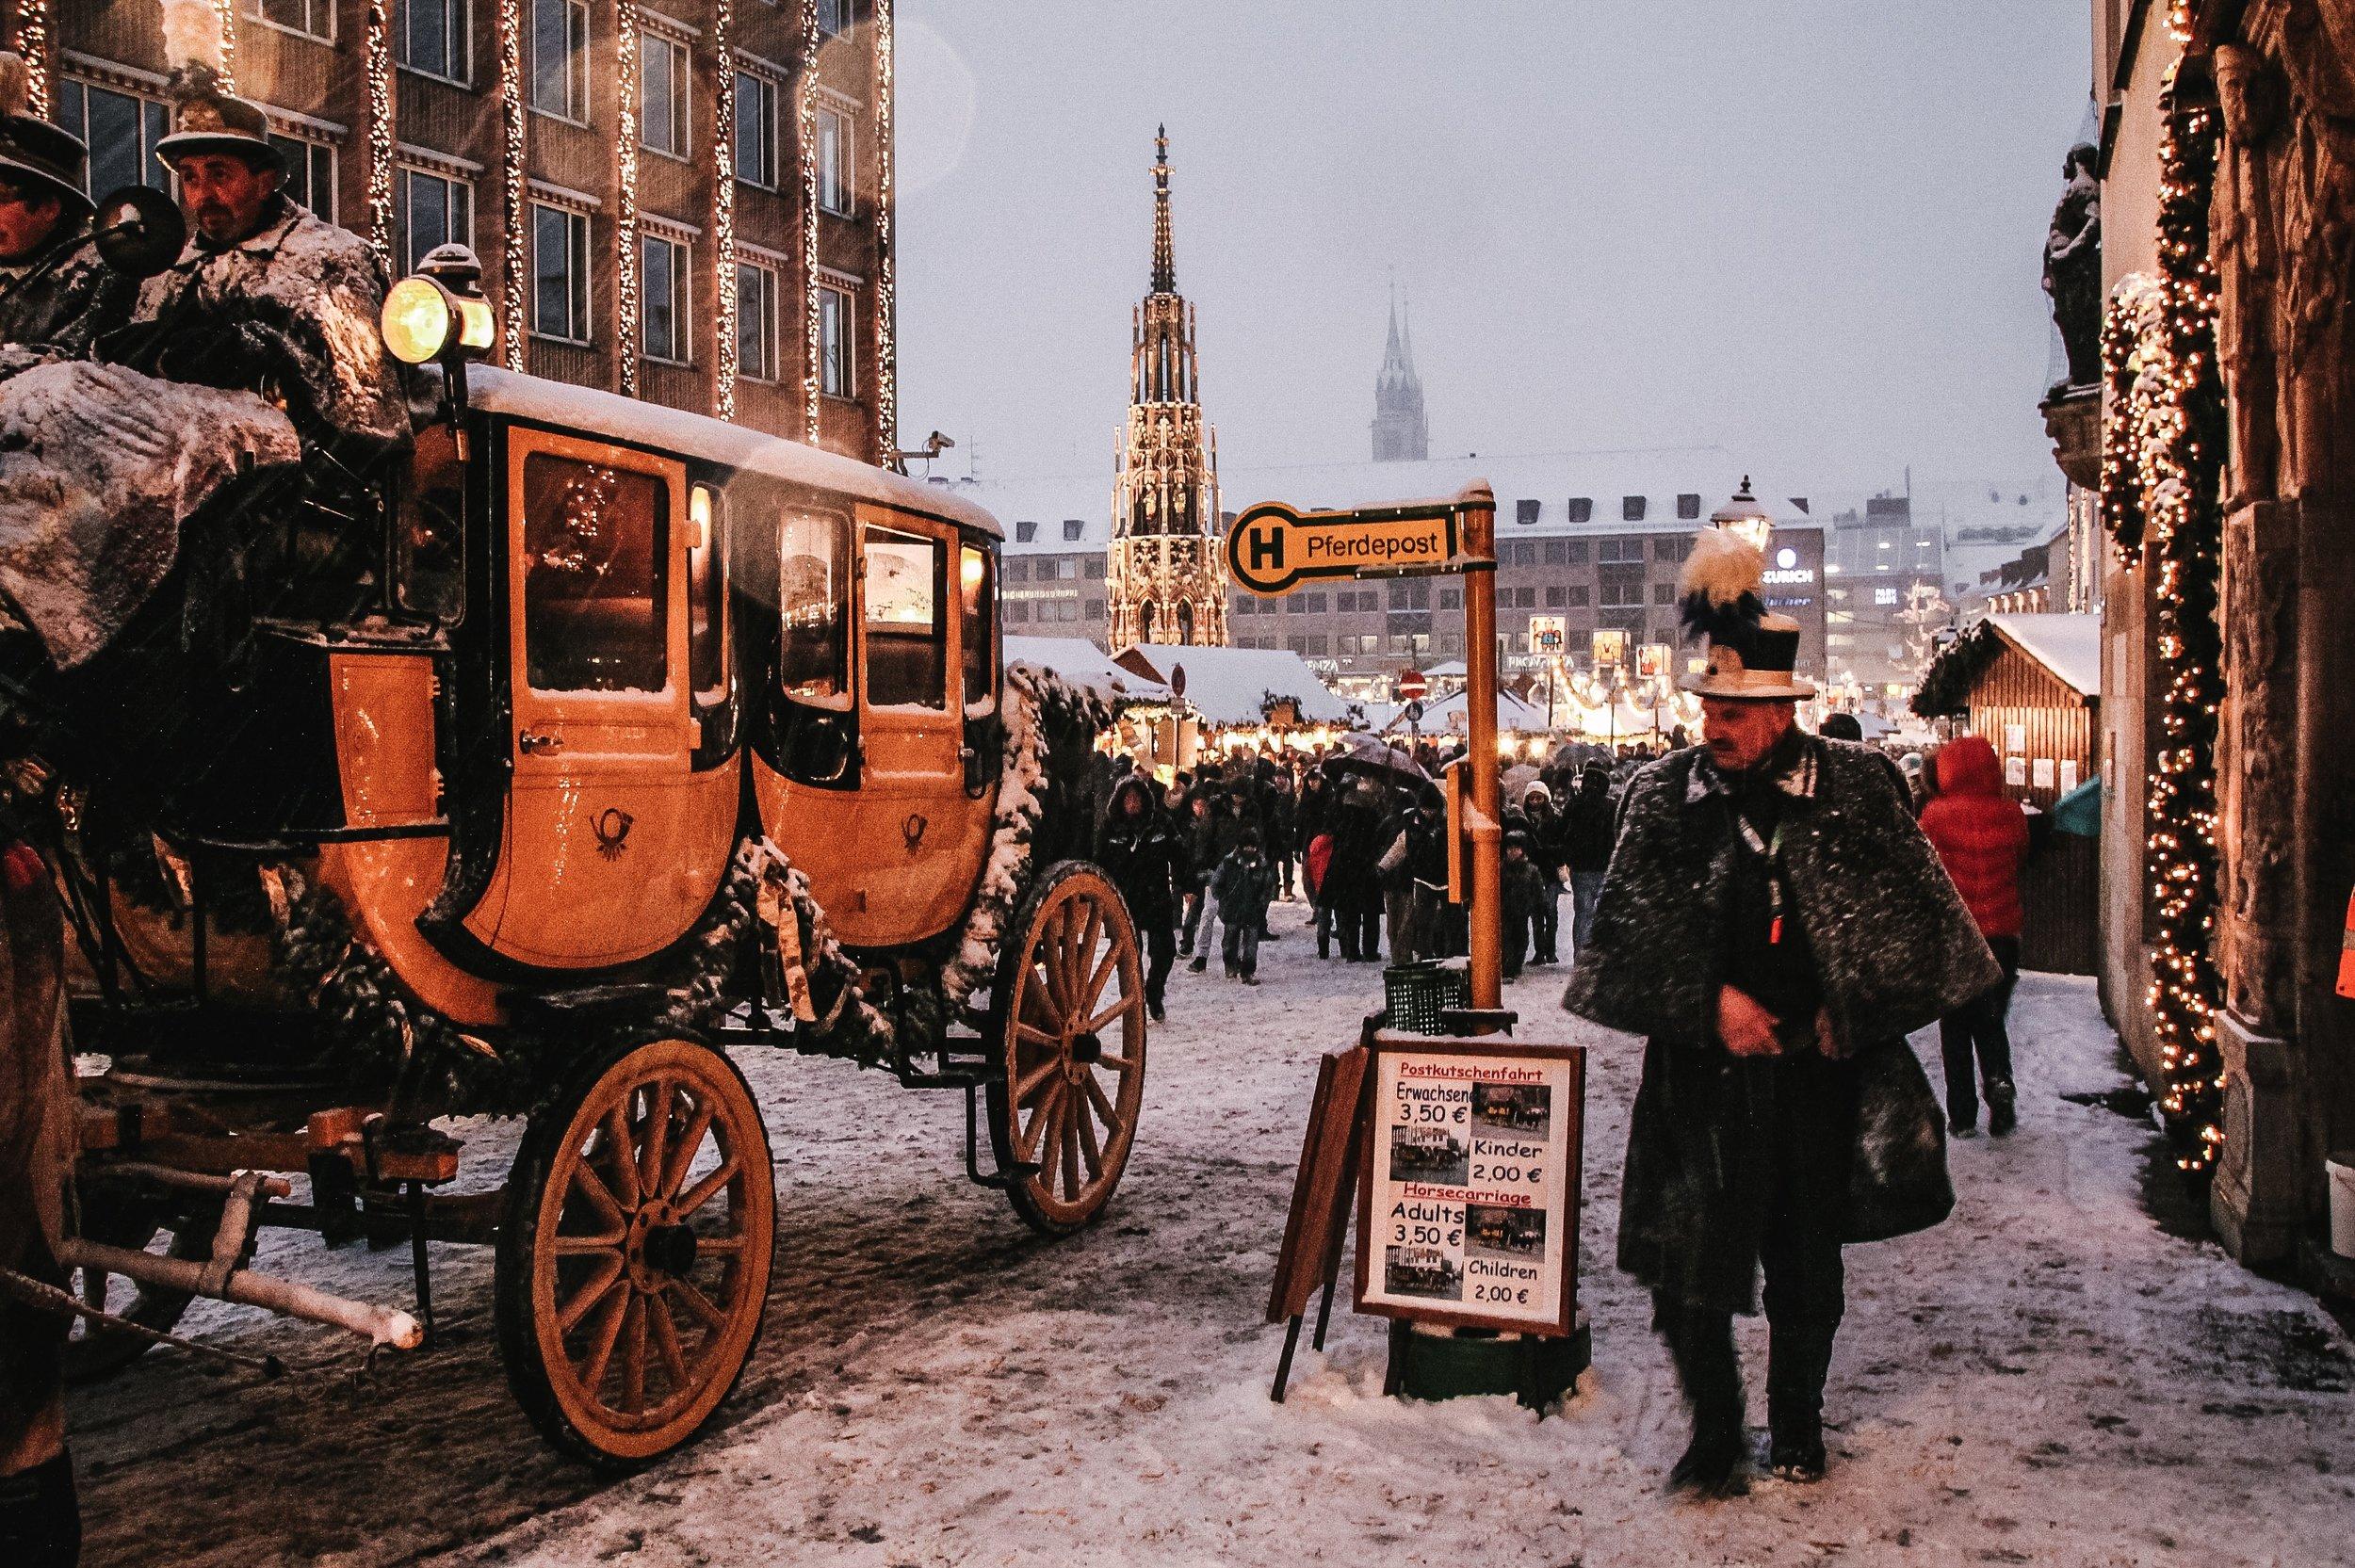 MERCADO EUROPEU NATAL LOLLA - Um mini guia para mercados de Natal na Alemanha